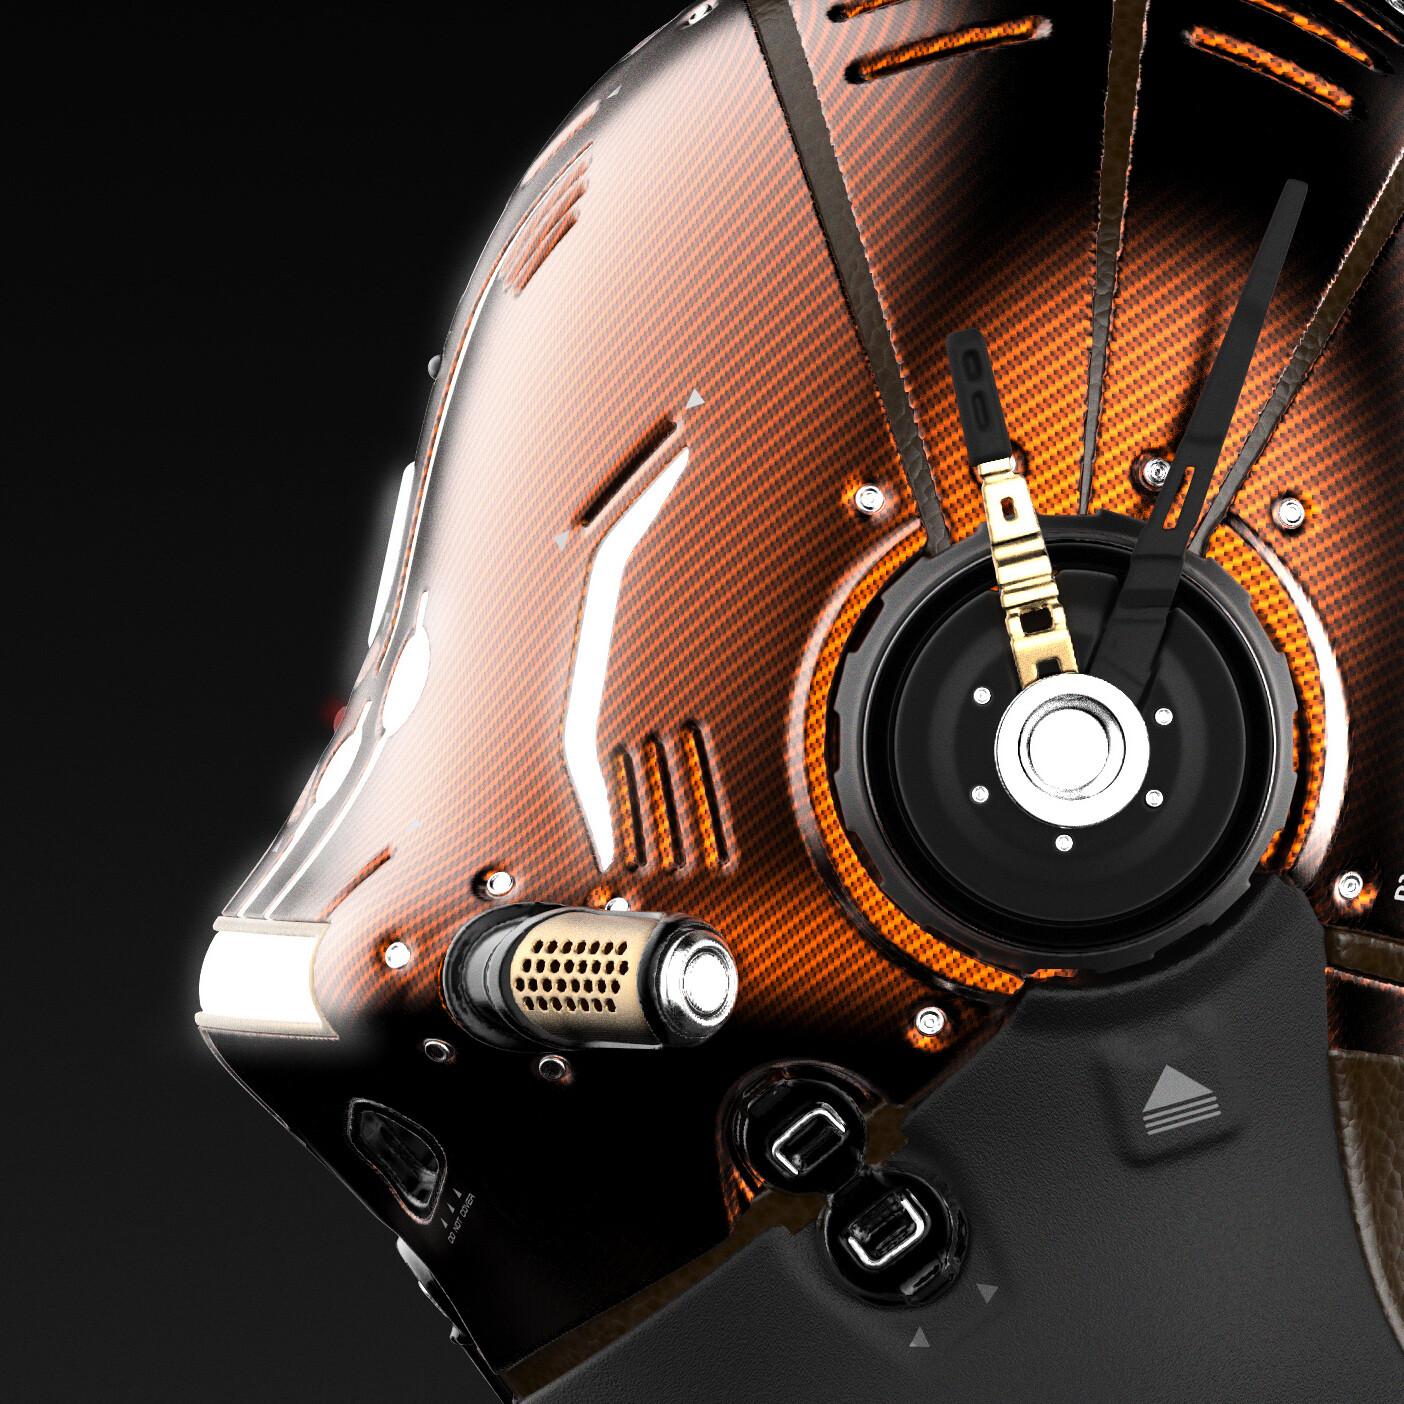 NEMO_Exosuit Explorer Helmet